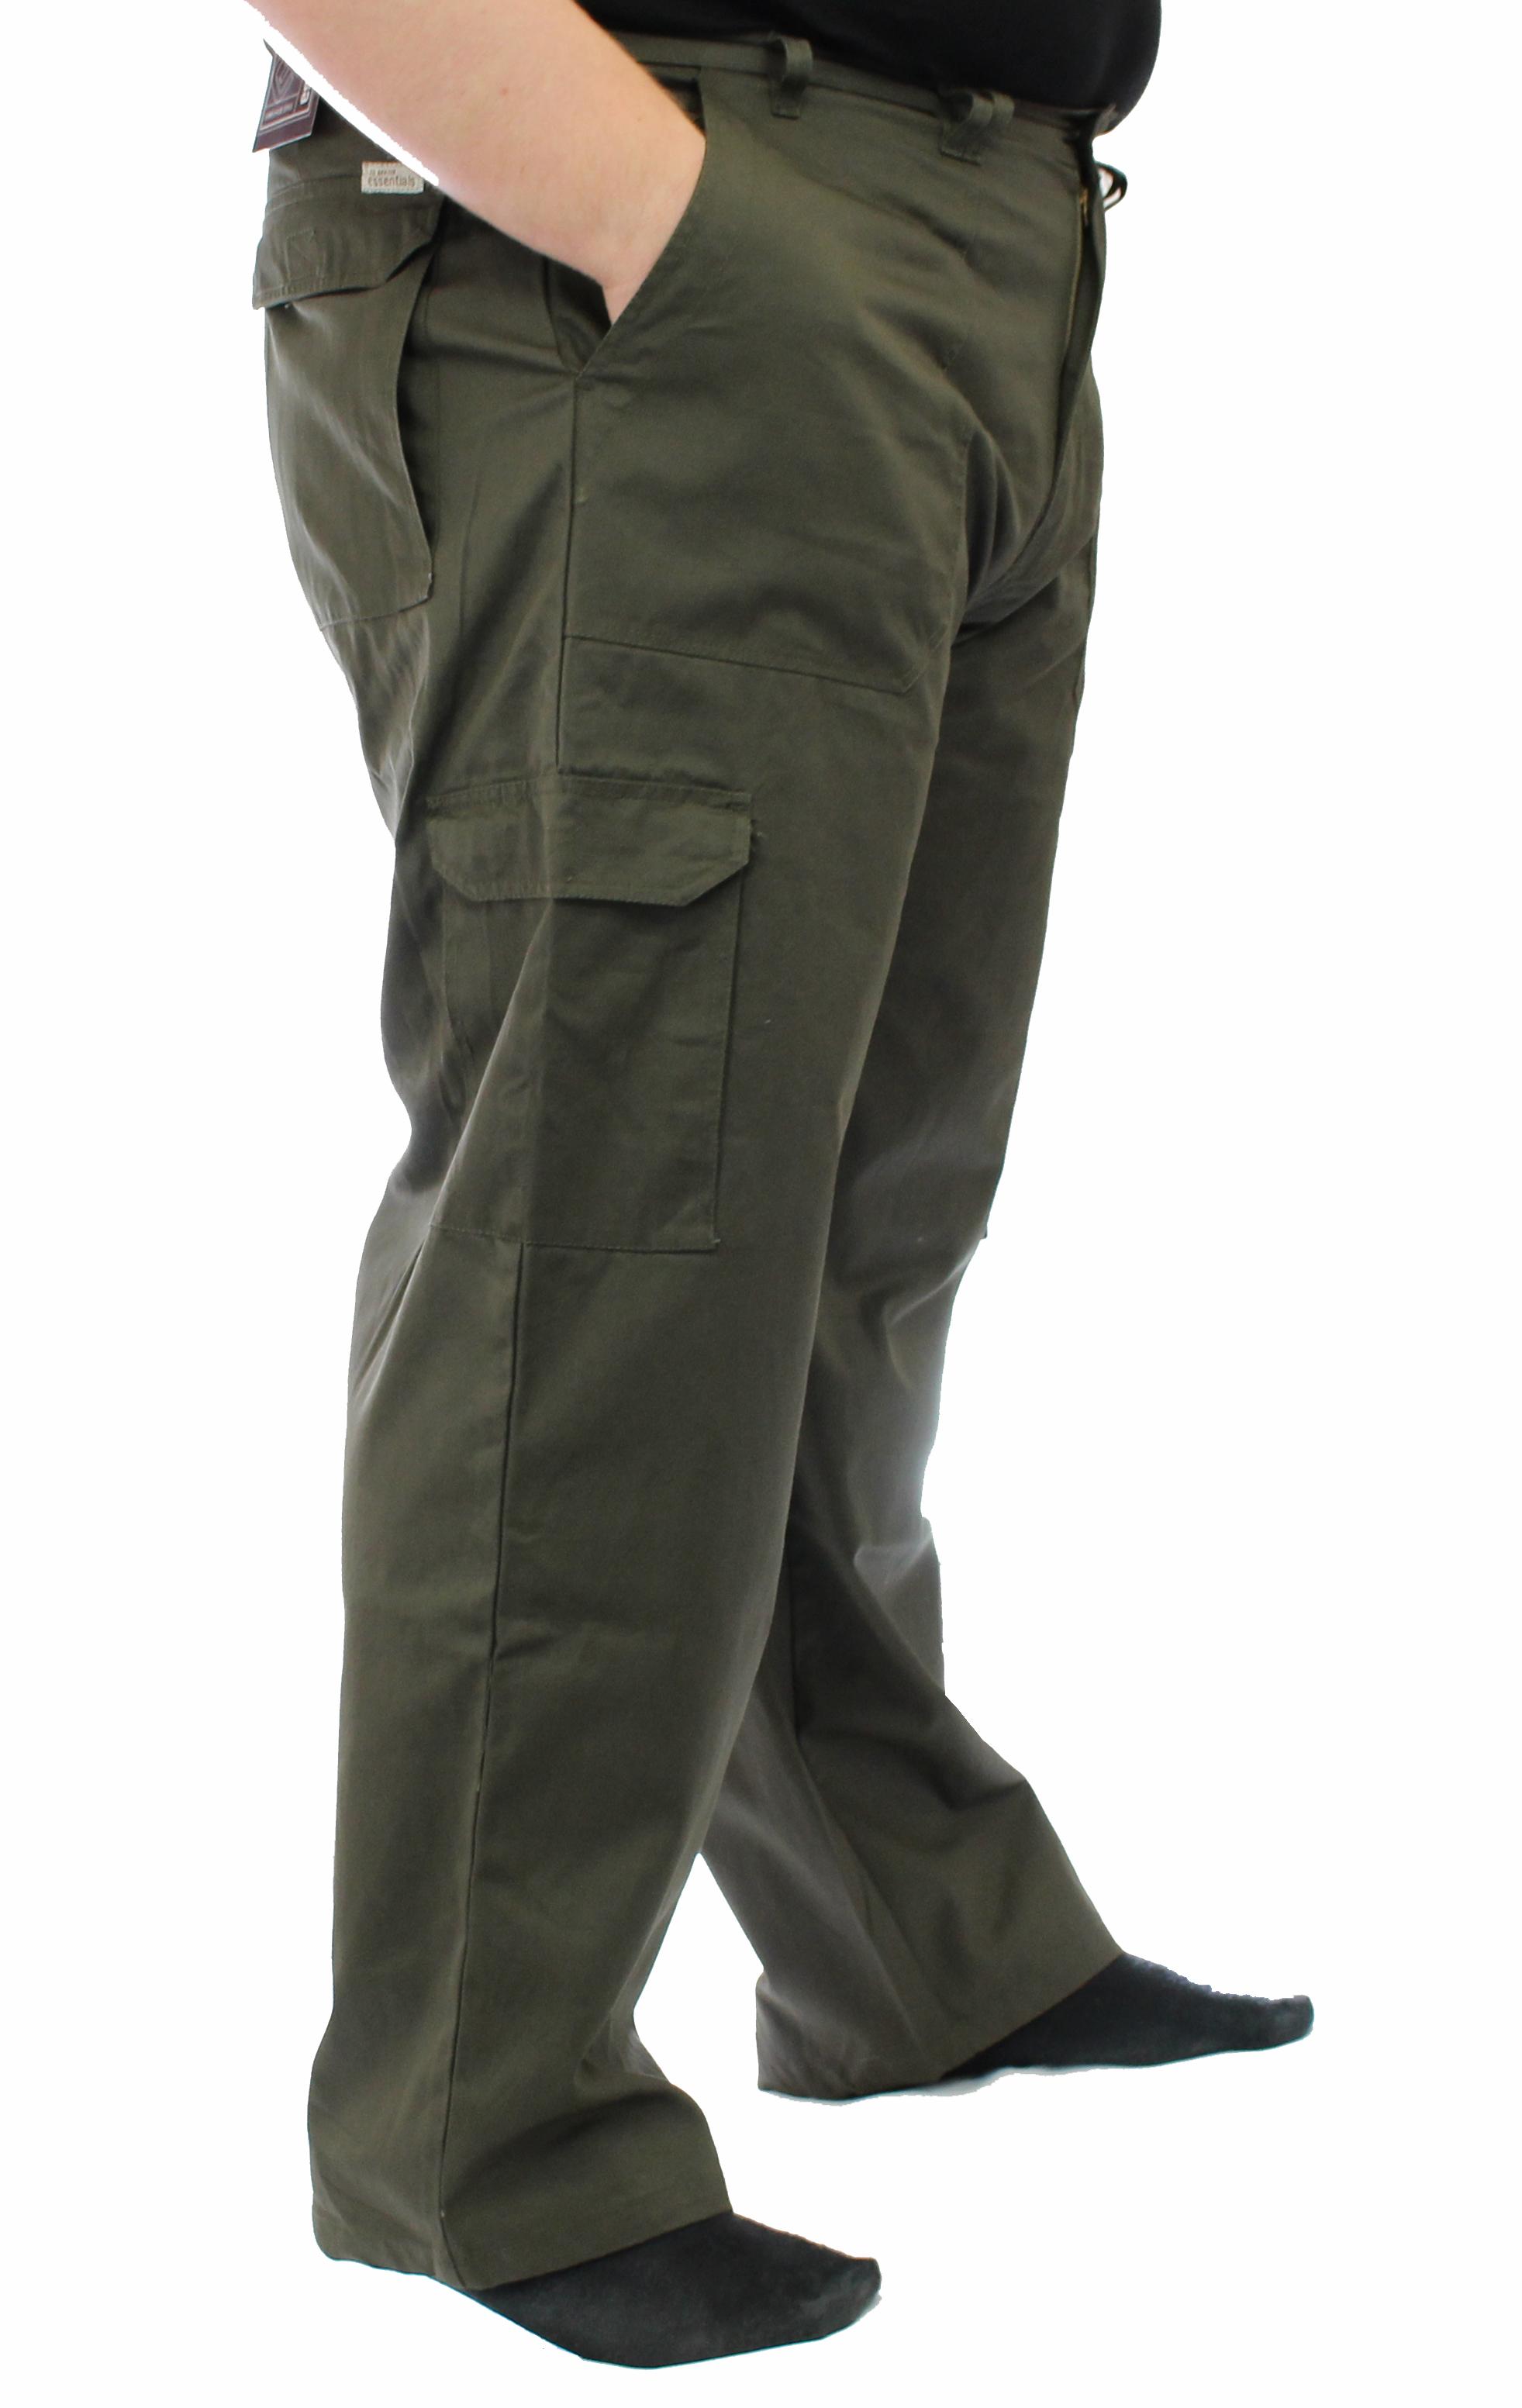 "Ed Baxter Victory - Heavy Duty Cargo Combat Trousers - Khaki - 48"" Waist, 30"" Leg"